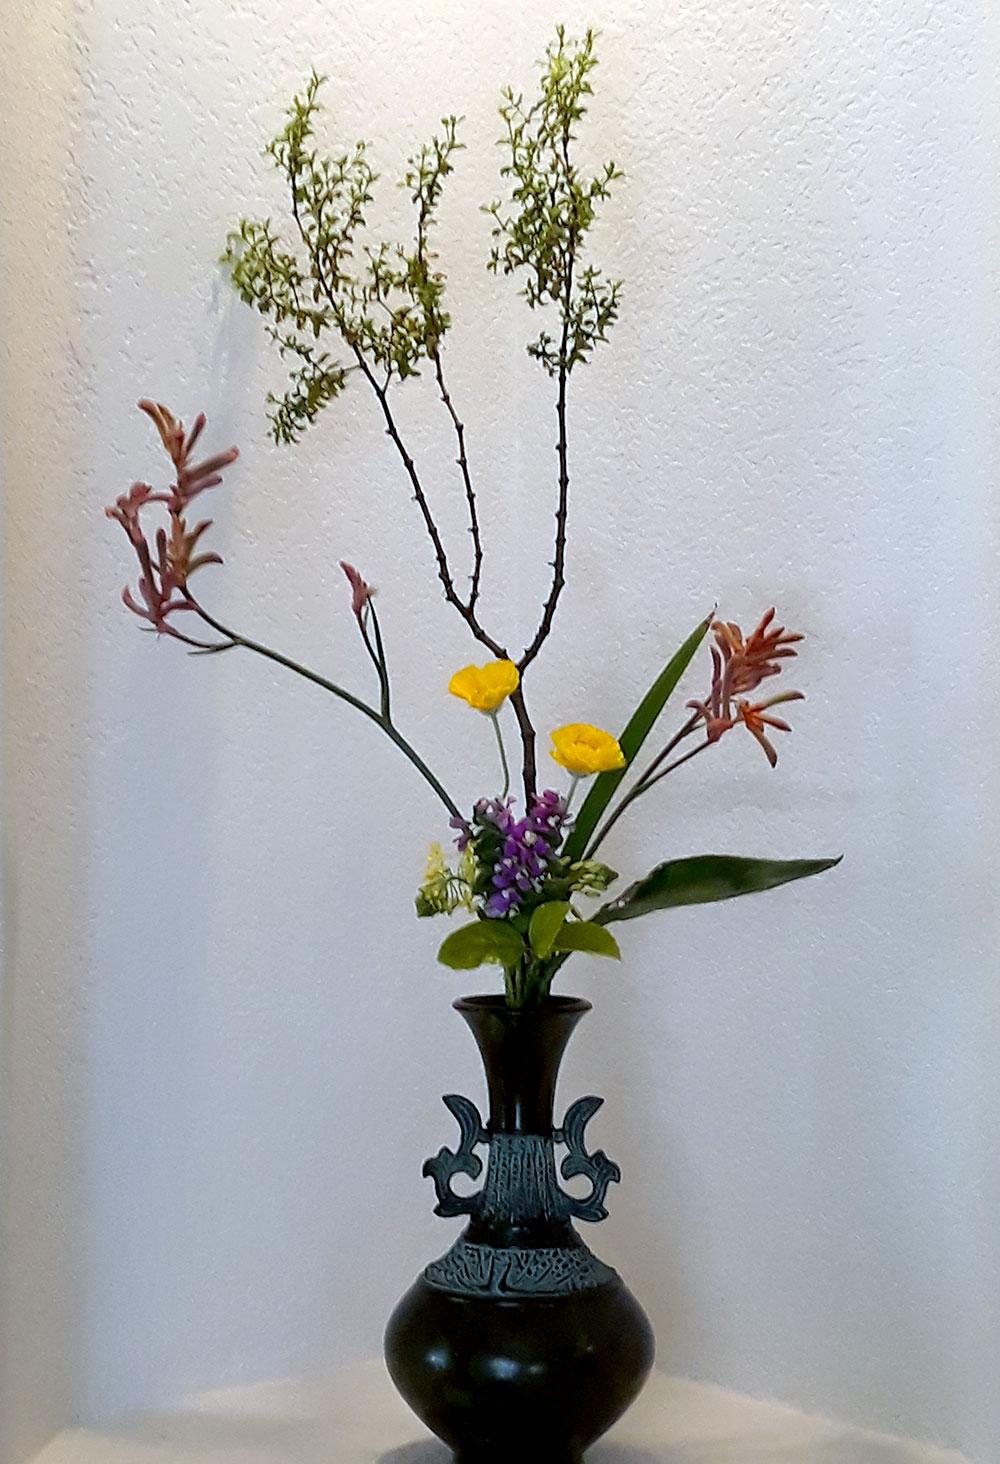 03-19-2020 Ikenobo Ikebana Tatehana Workshop Lesson